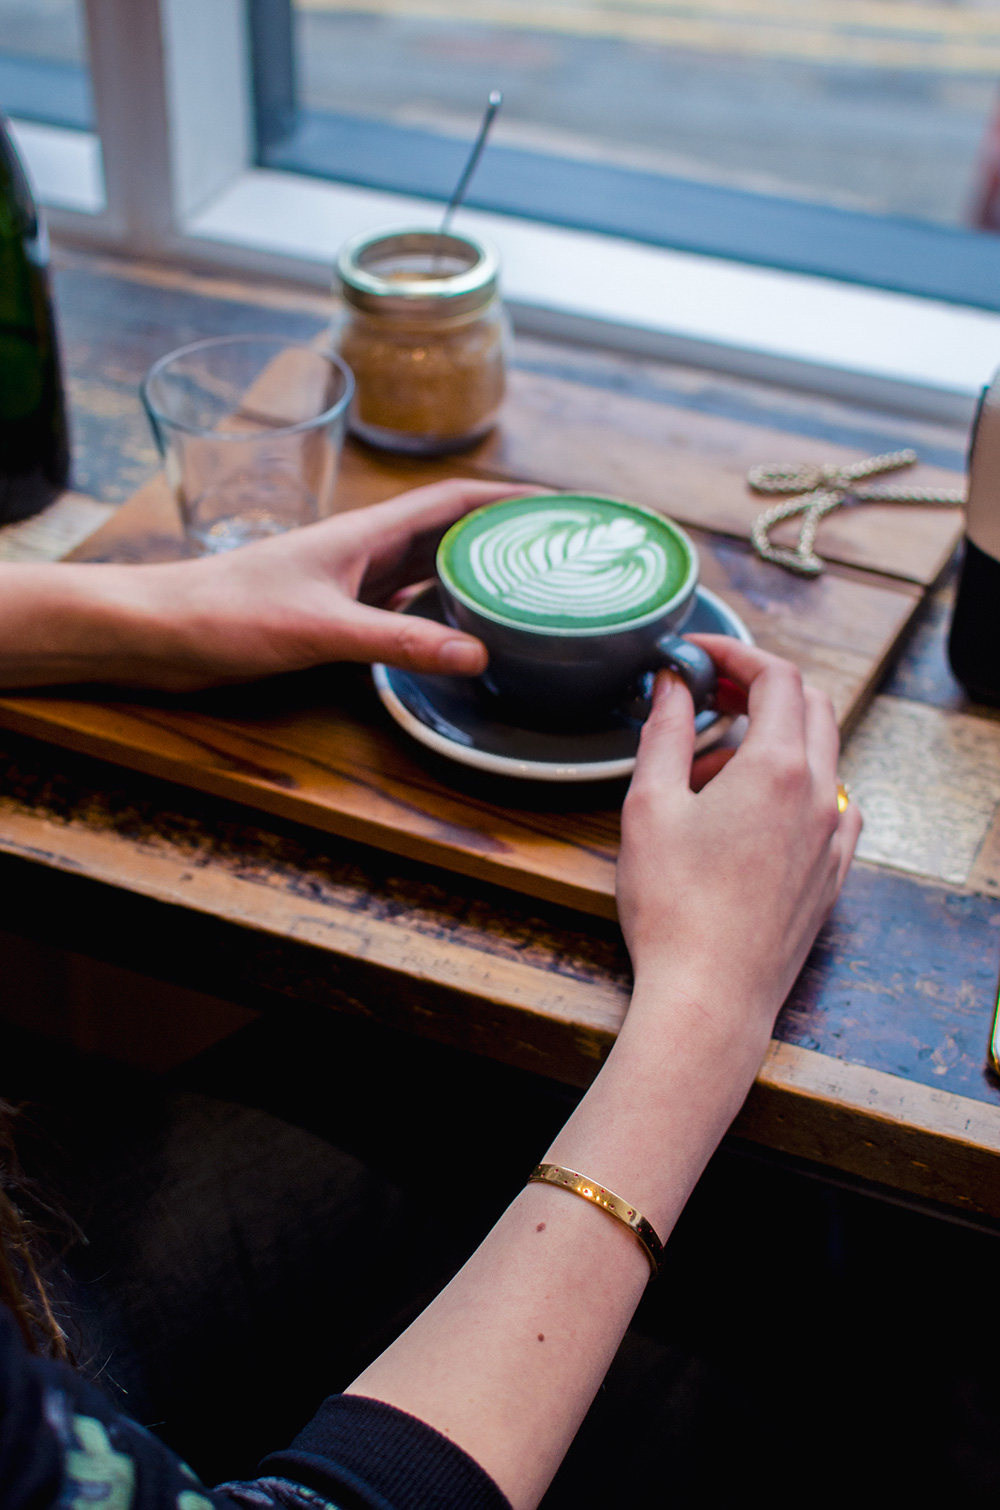 how-to-relax-at-a-city-break-zoe-karssen-royal-sweater-timberyard-london-5